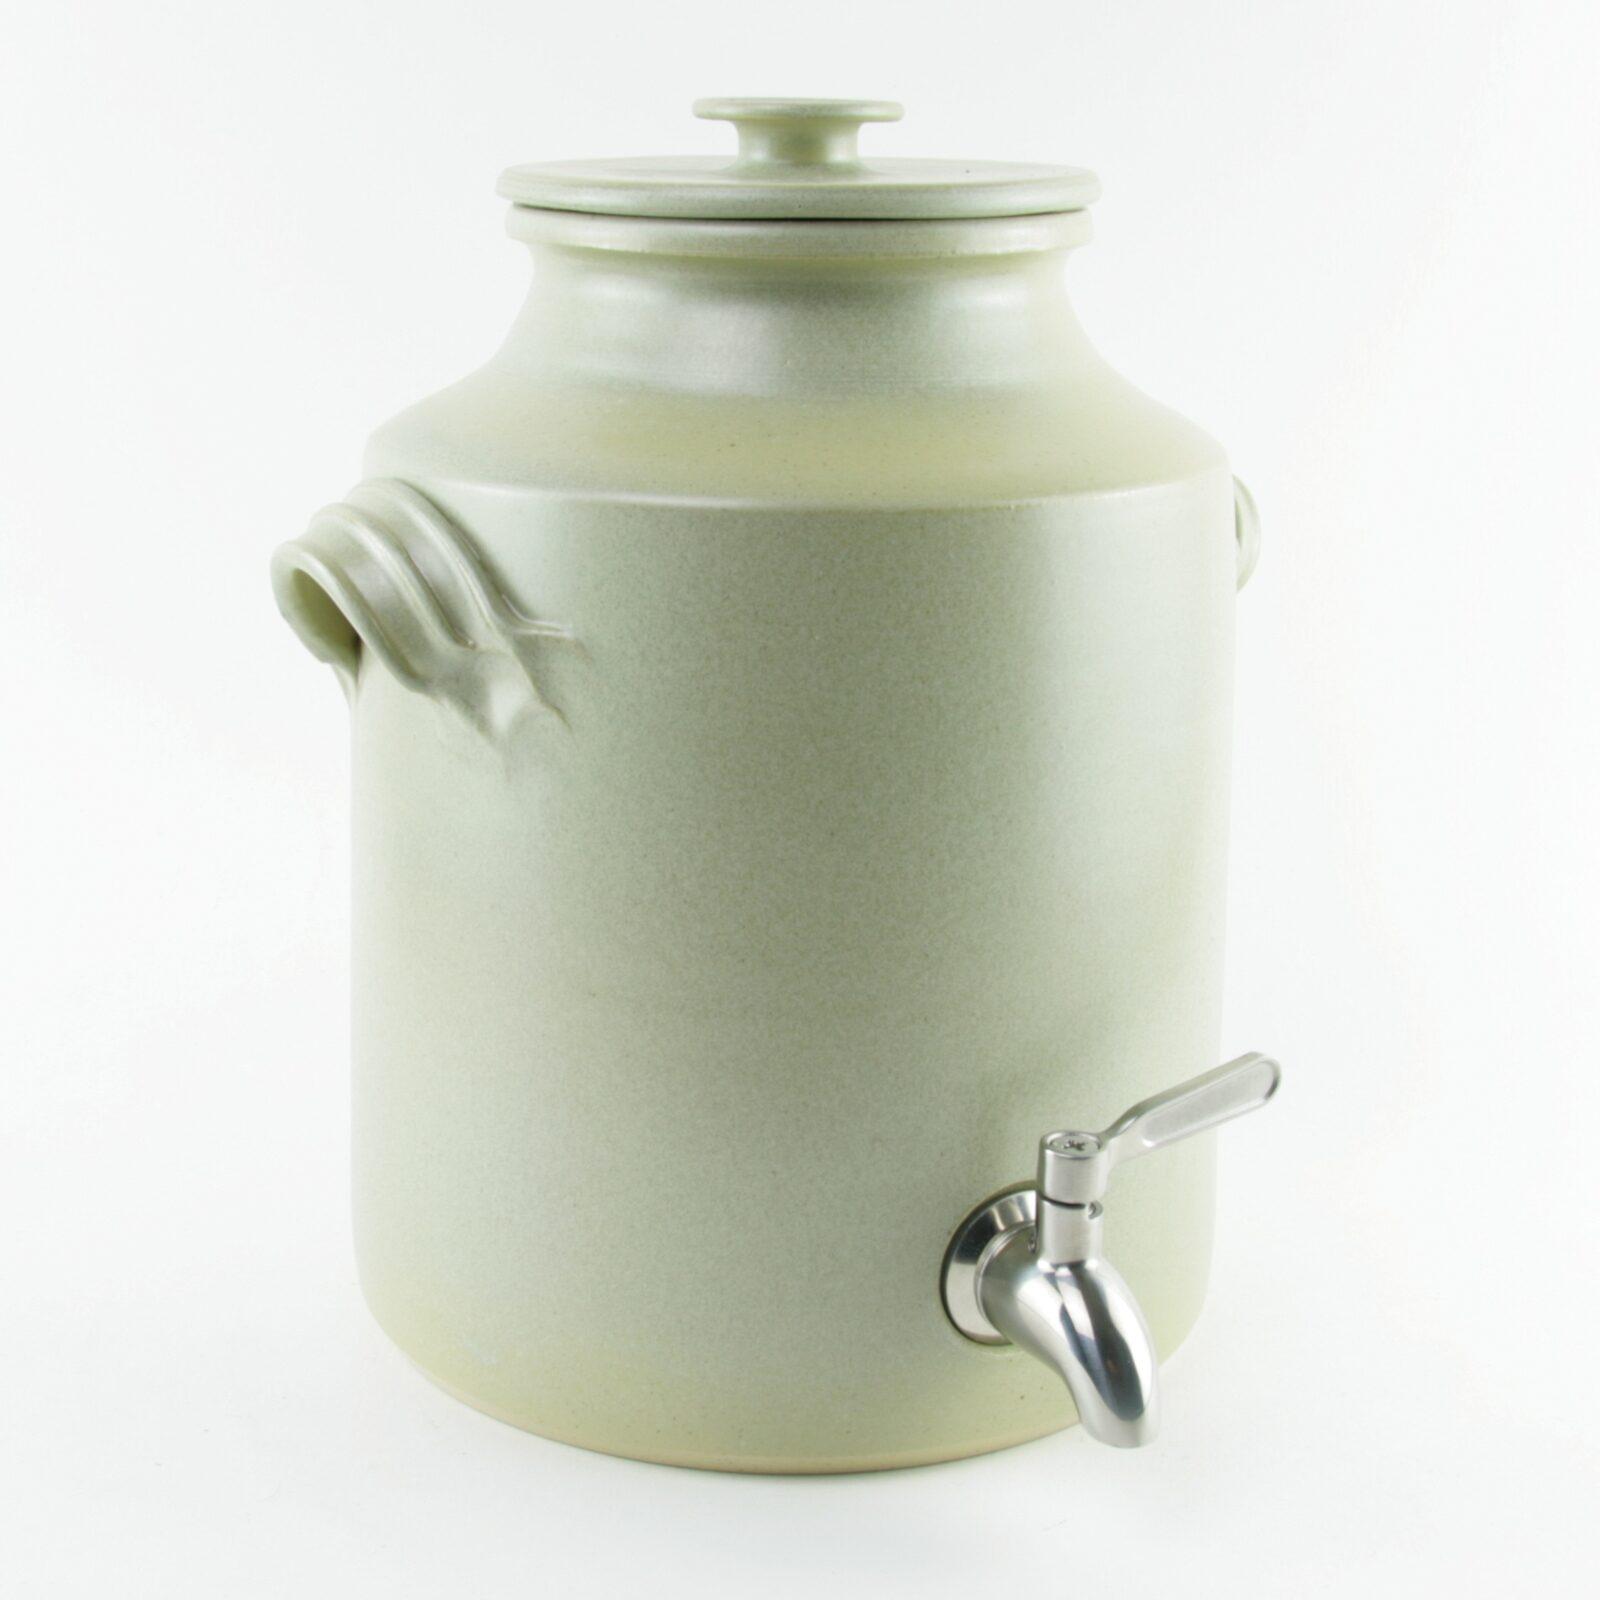 Large ceramic vinegar crock 4 litres